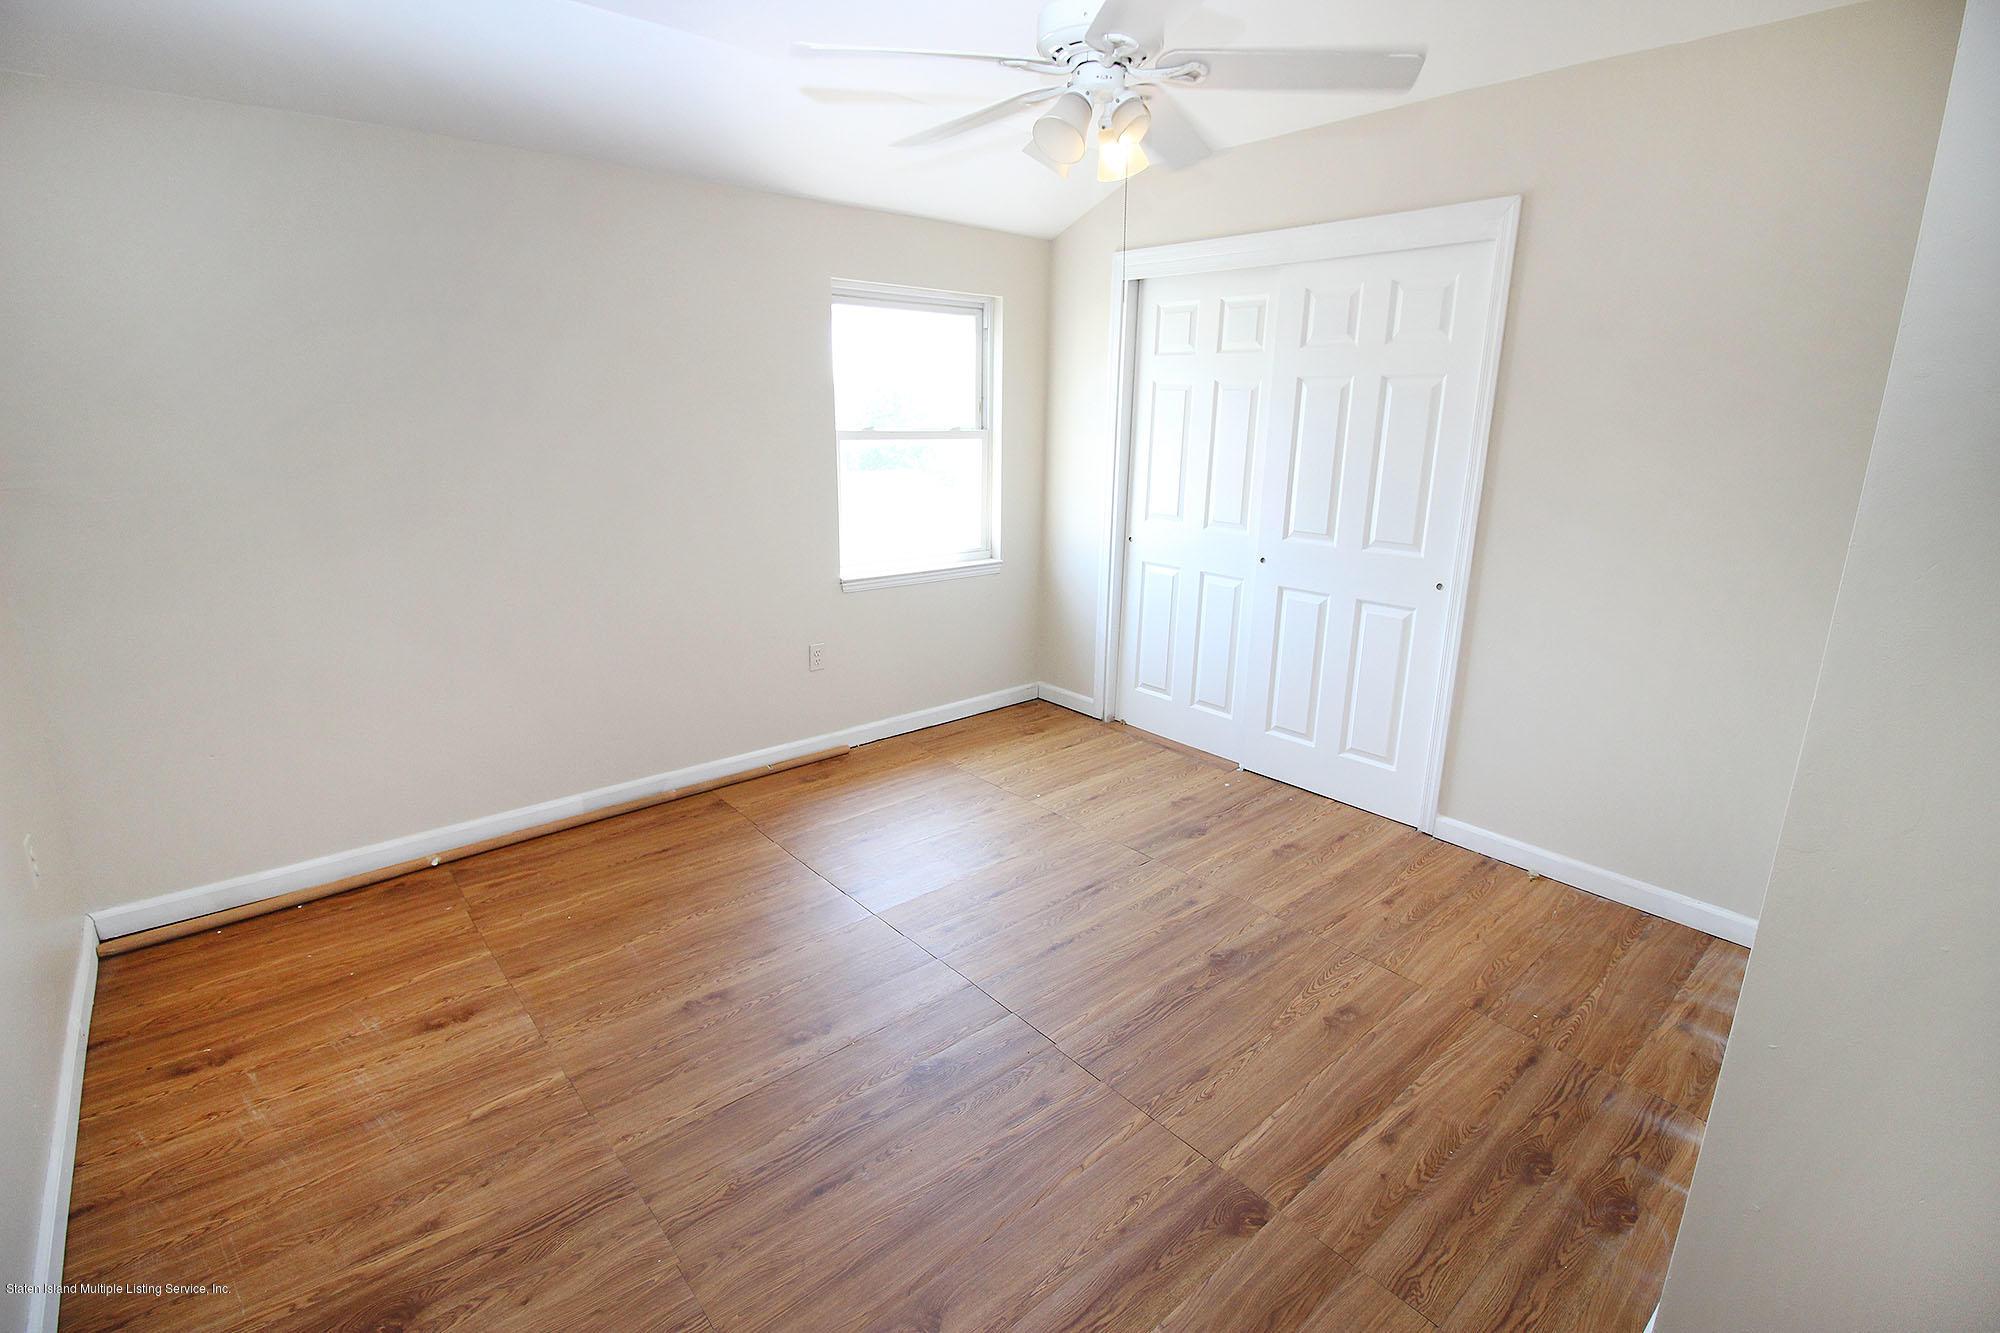 Single Family - Semi-Attached 230 Holden Boulevard  Staten Island, NY 10314, MLS-1139241-11